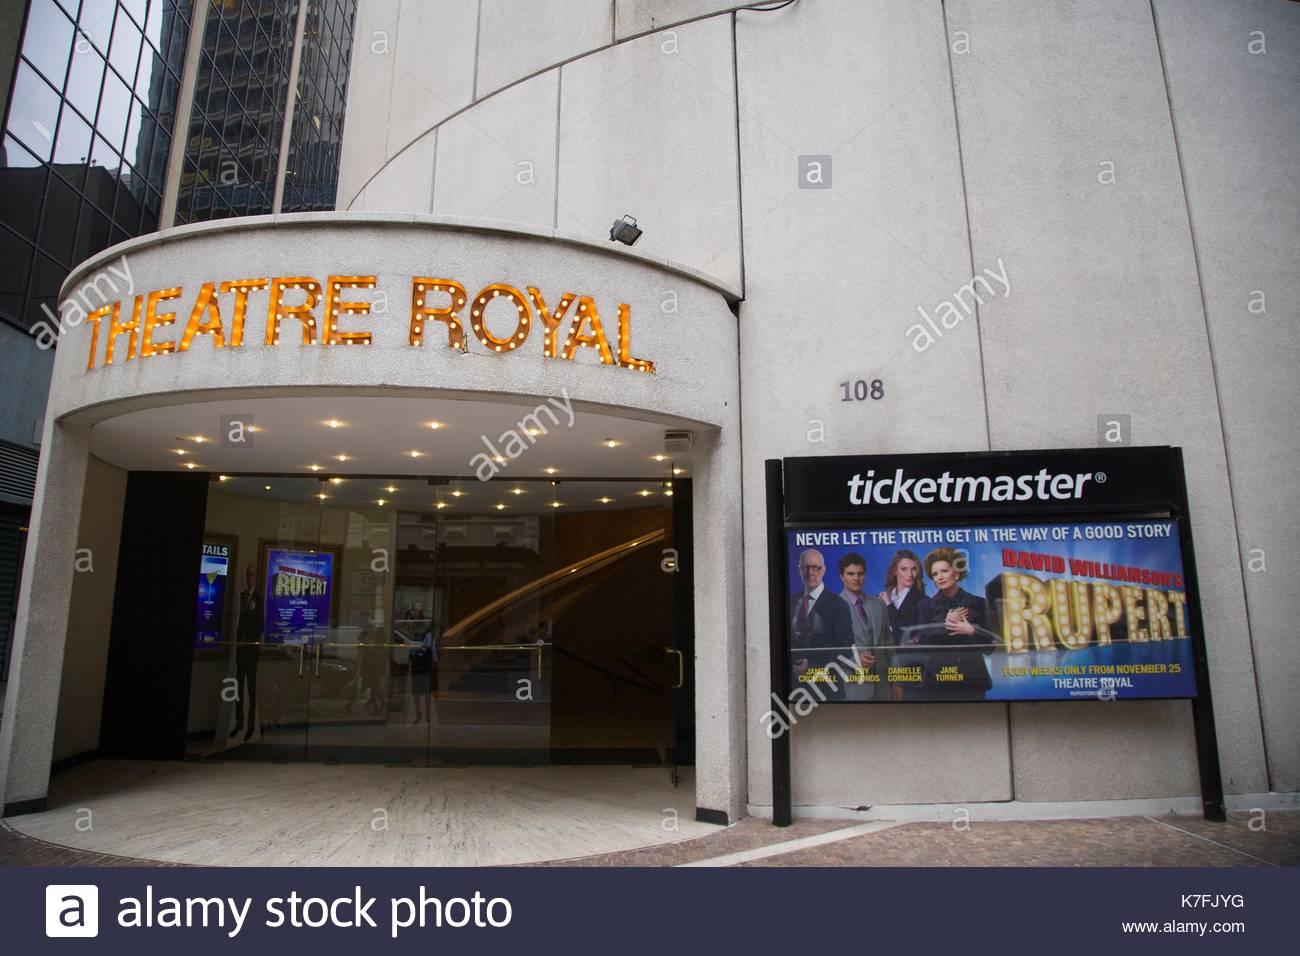 theatre royal sydney stock photos theatre royal sydney. Black Bedroom Furniture Sets. Home Design Ideas